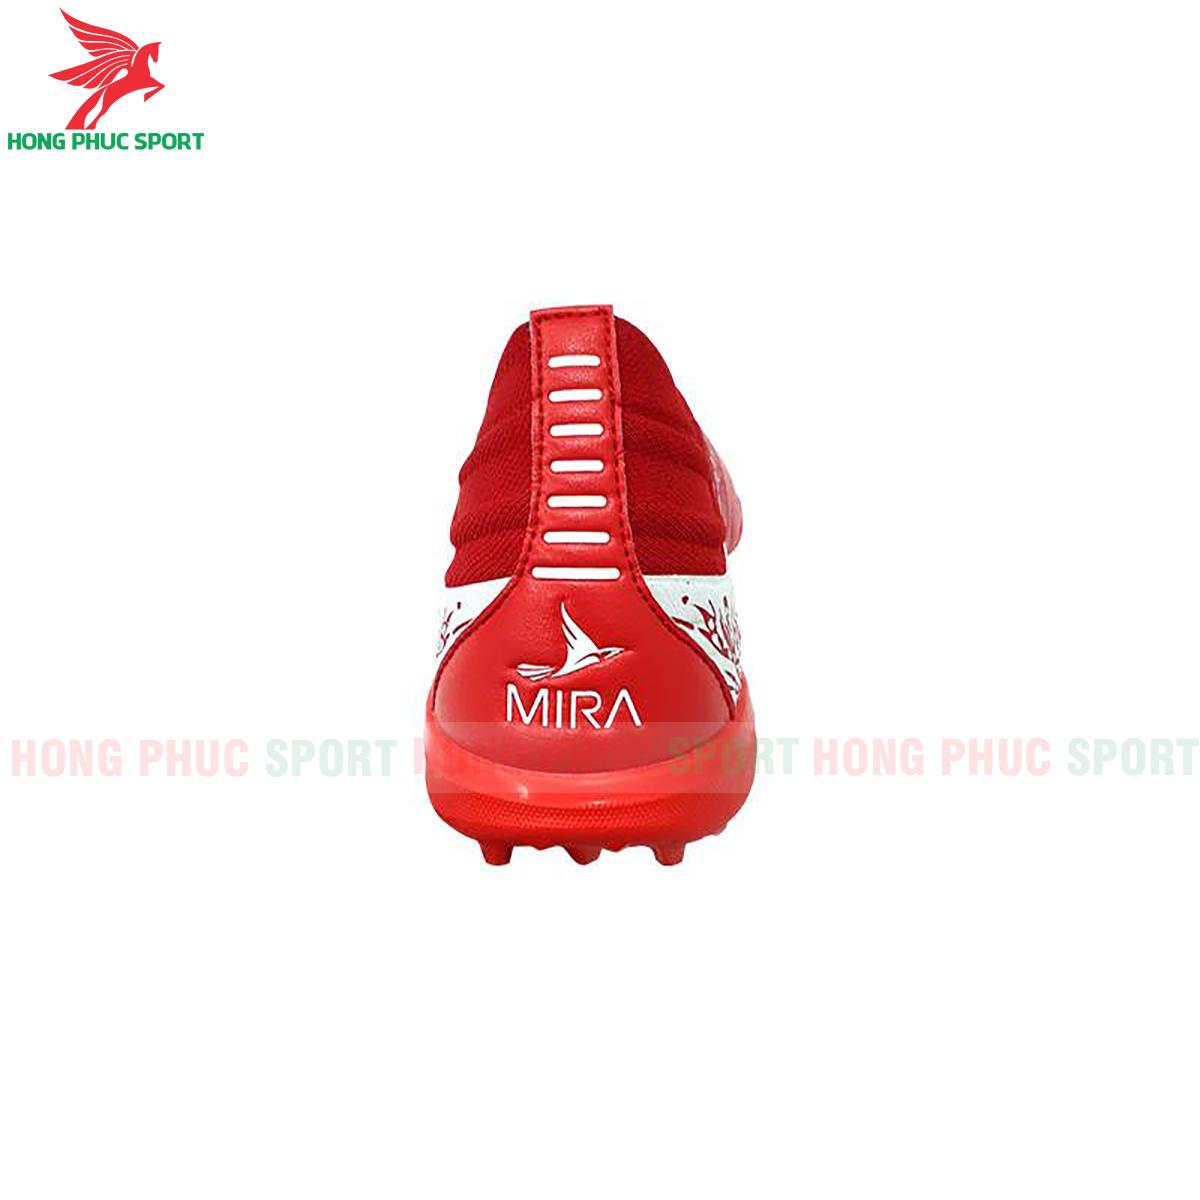 https://cdn.hongphucsport.com/unsafe/s4.shopbay.vn/files/285/giay-da-bong-mira-winner-do-5-5f73fc37126b4.png